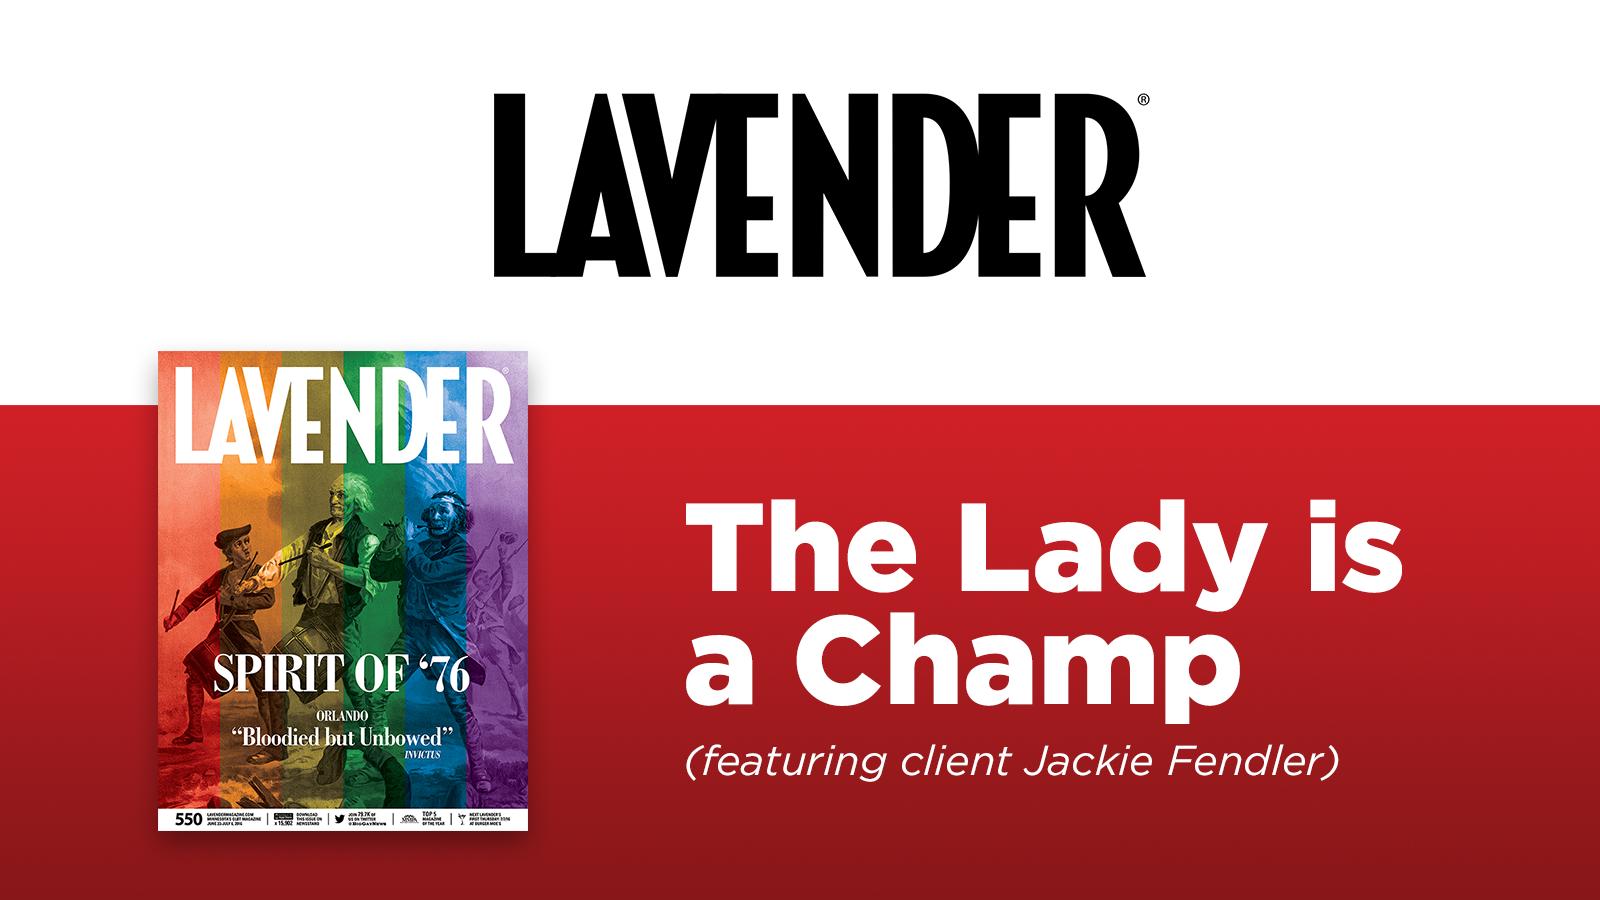 2017-04-27: Lavender